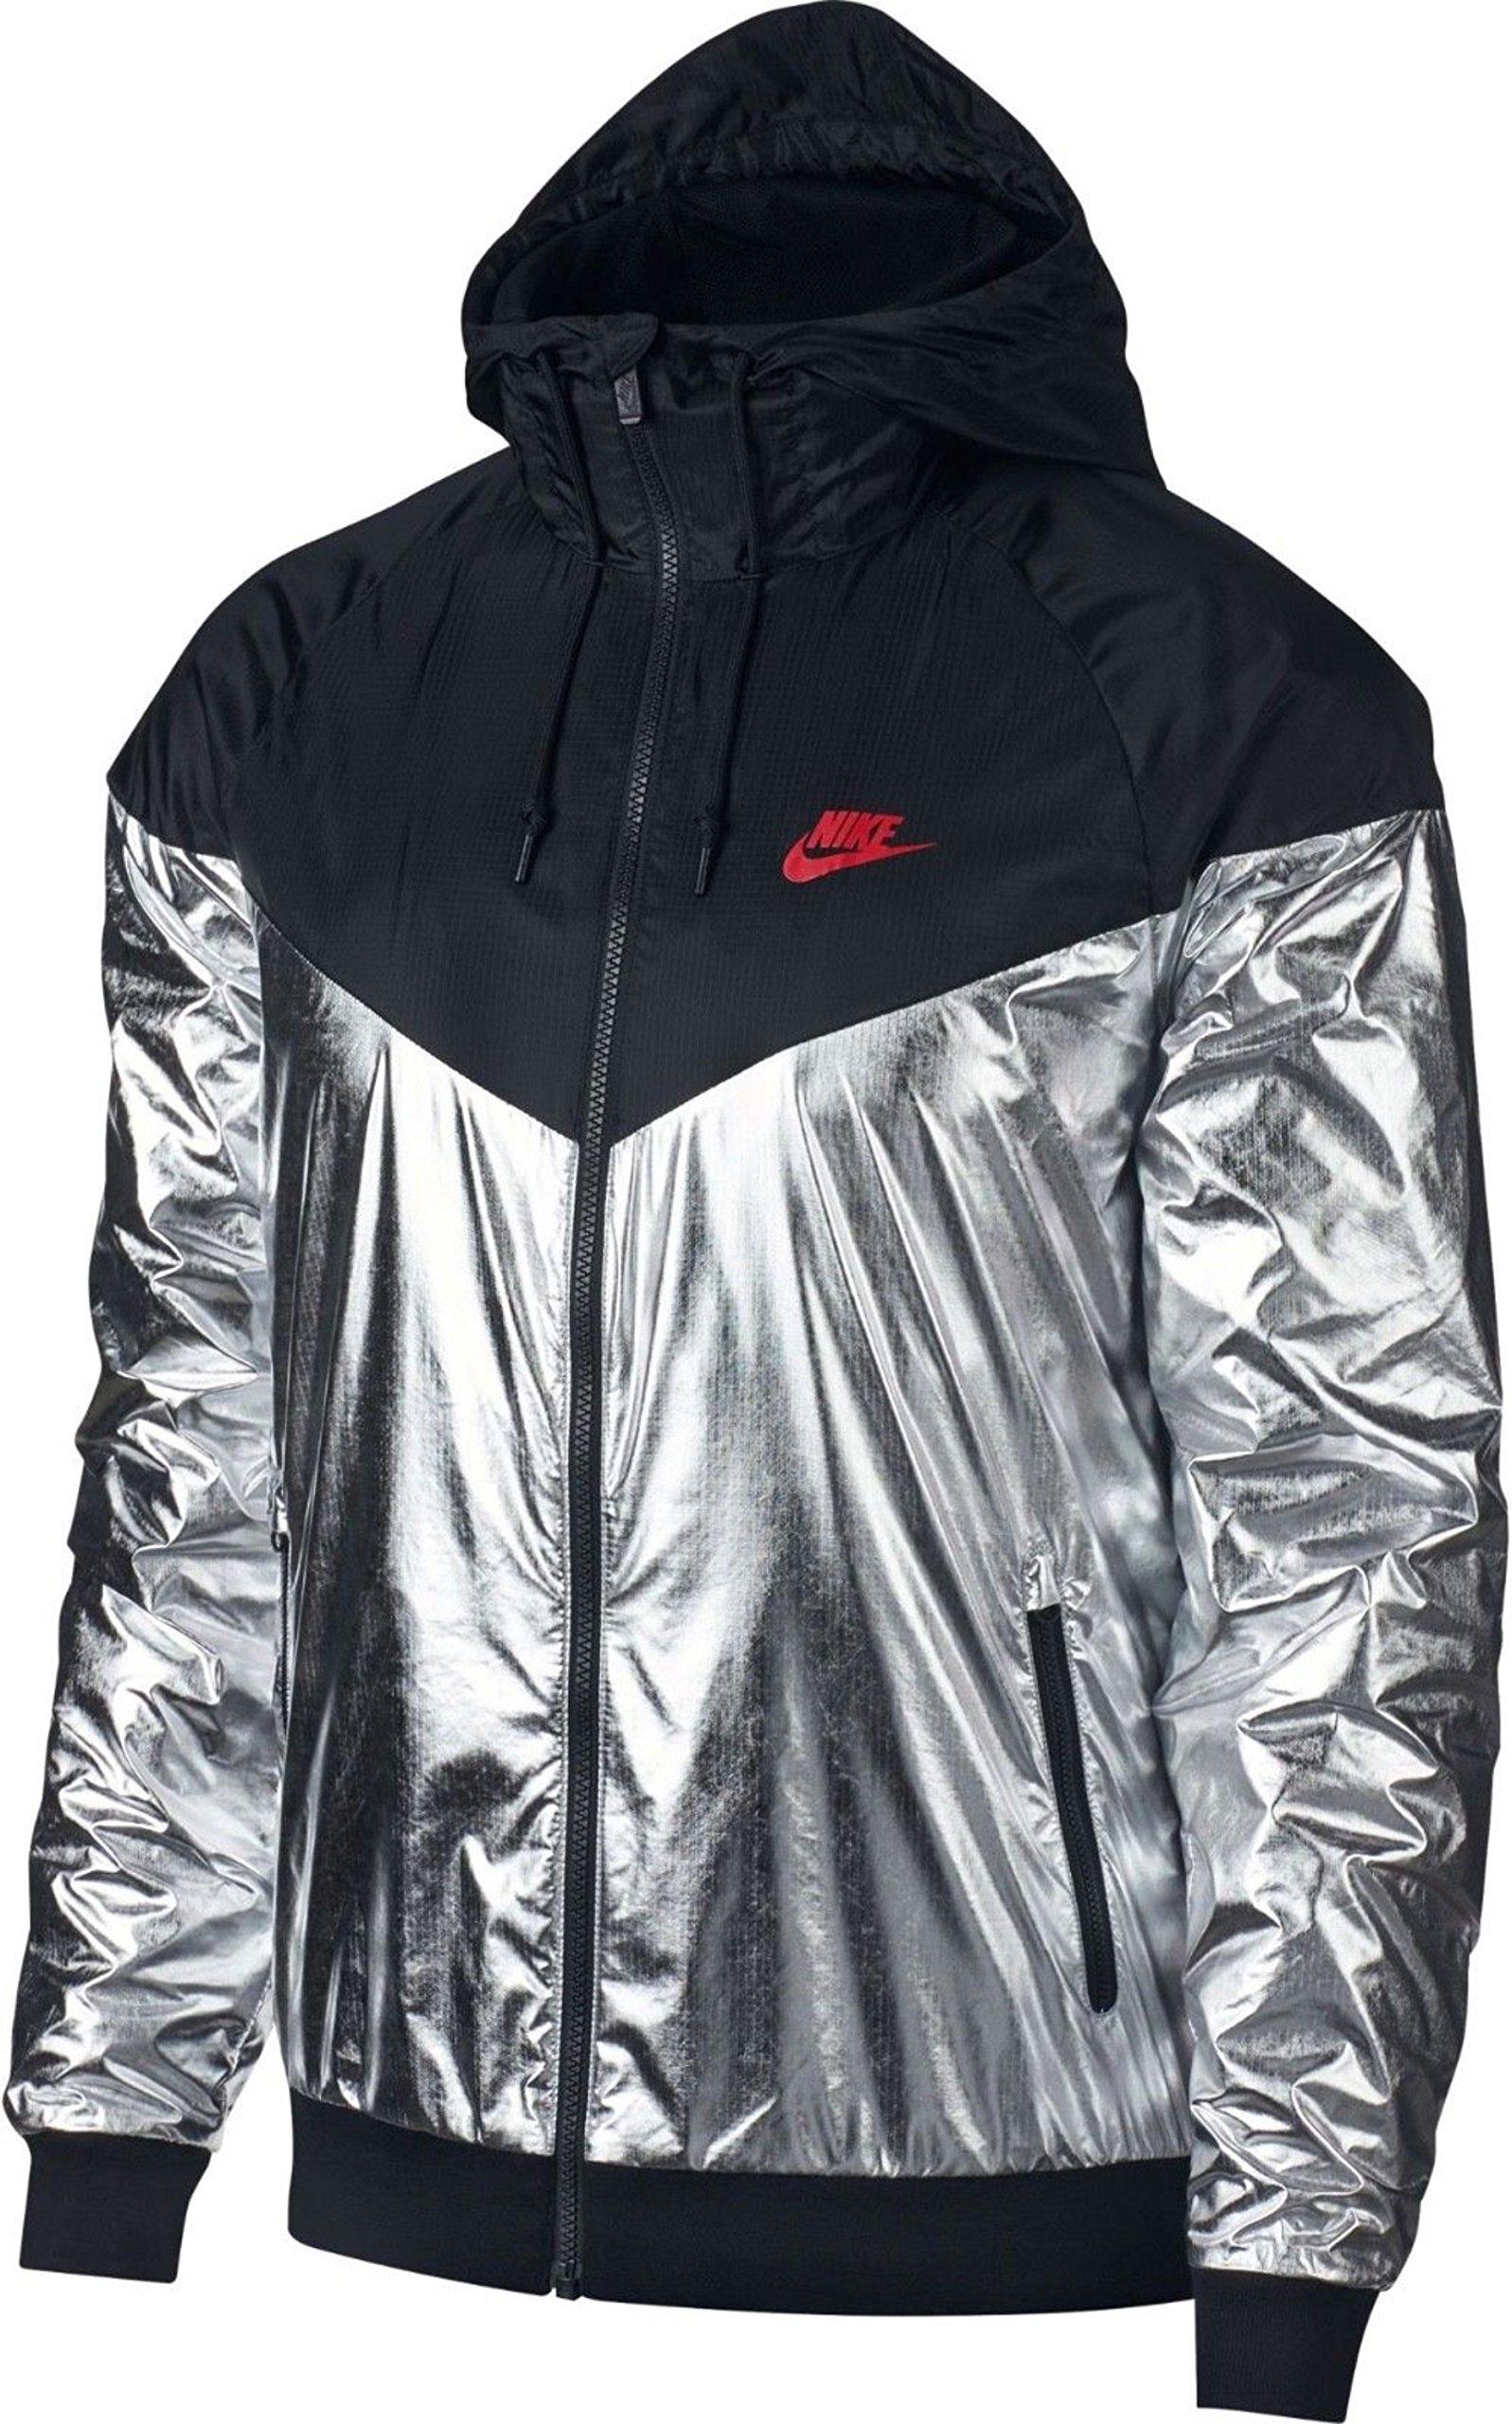 6d925b697b991 Galleon - NIKE Men's Sportswear Windrunner Jacket (Large, Metallic SSilver/ Black/Red)